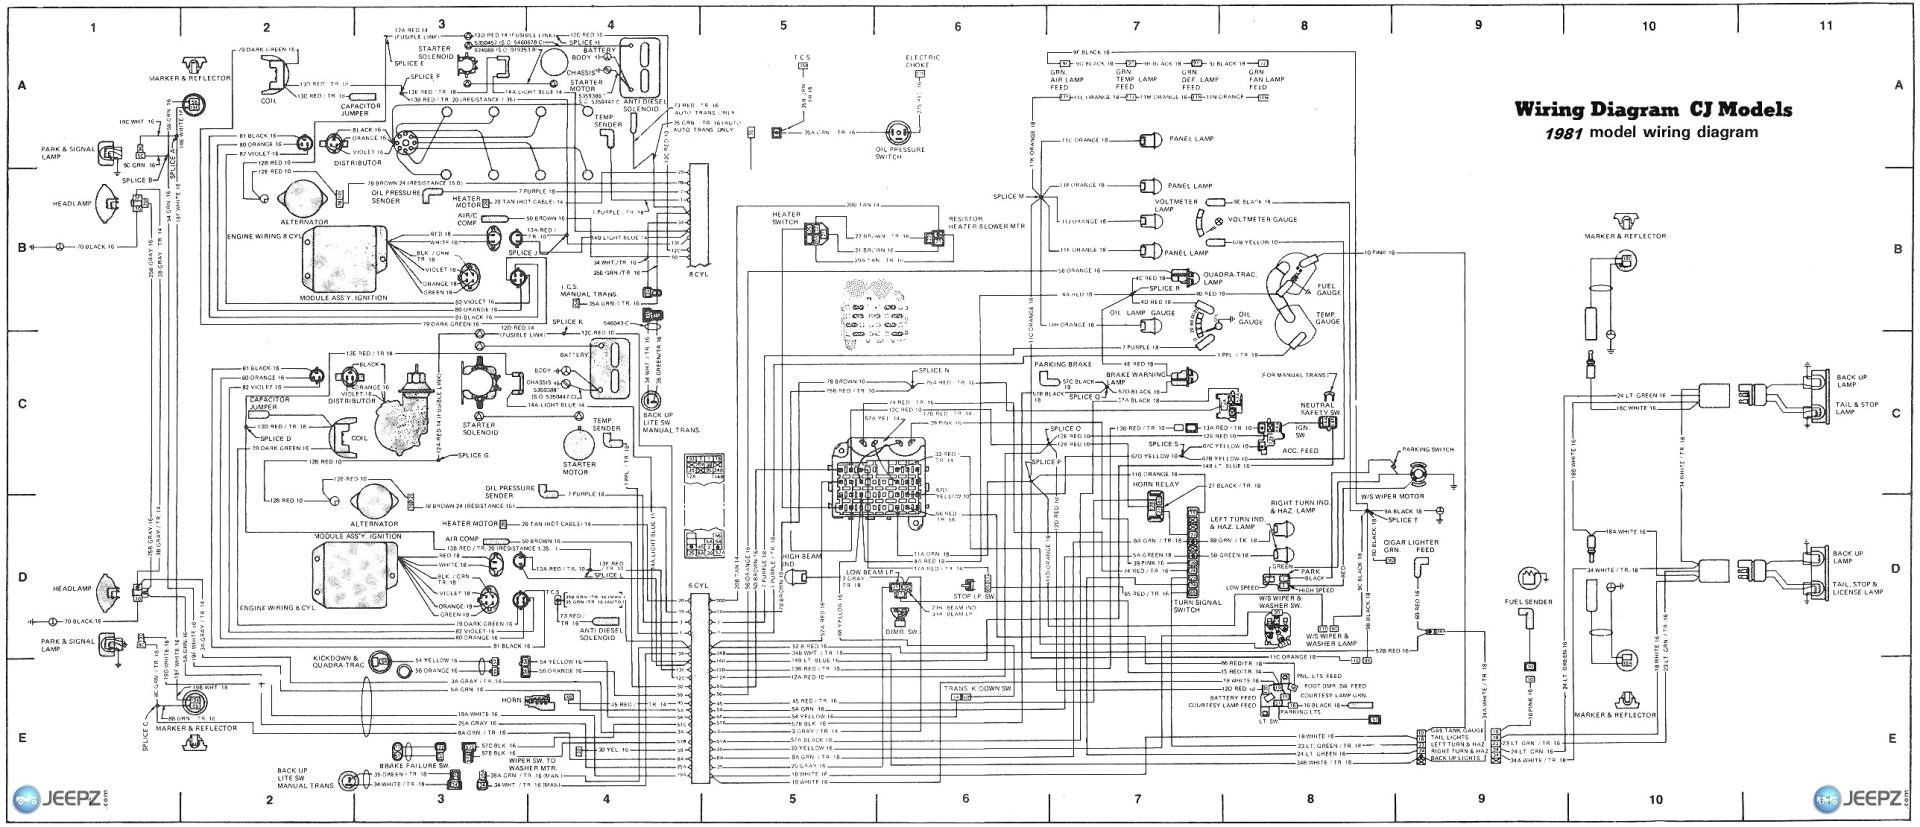 Clark Gcx30e Wiring Diagram | Wiring Diagram on